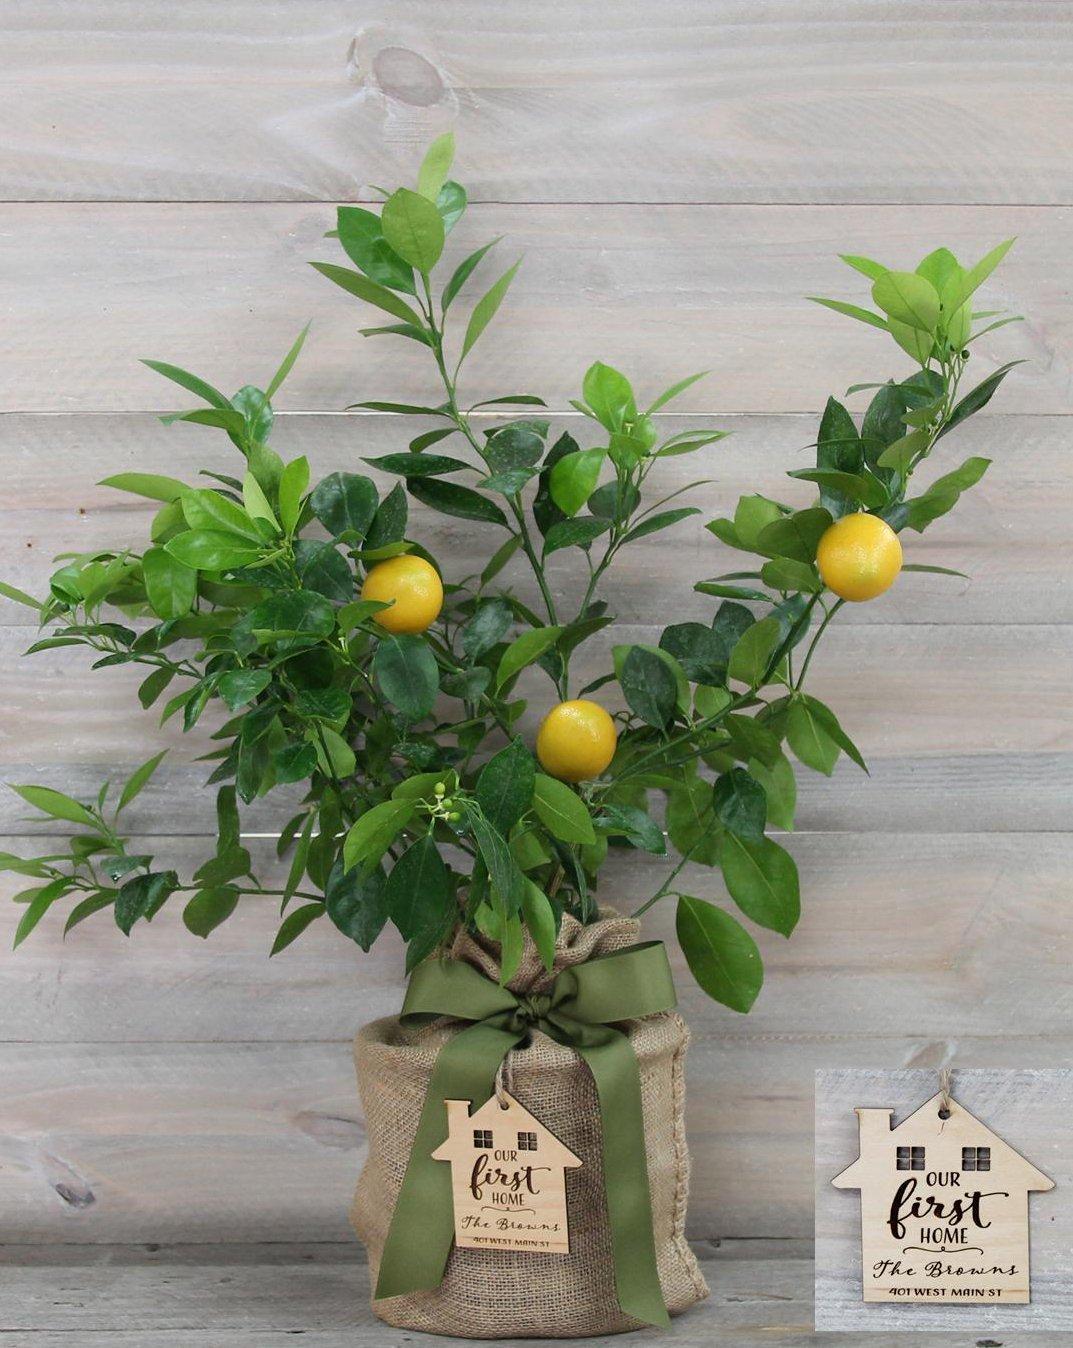 The Magnolia Company Housewarming Meyer Lemon Gift Tree by Get Fruit 1st Year, Dwarf Fruit Tree with Juicy Sweet Lemons, NO SHIP TO TX, LA, AZ and CA